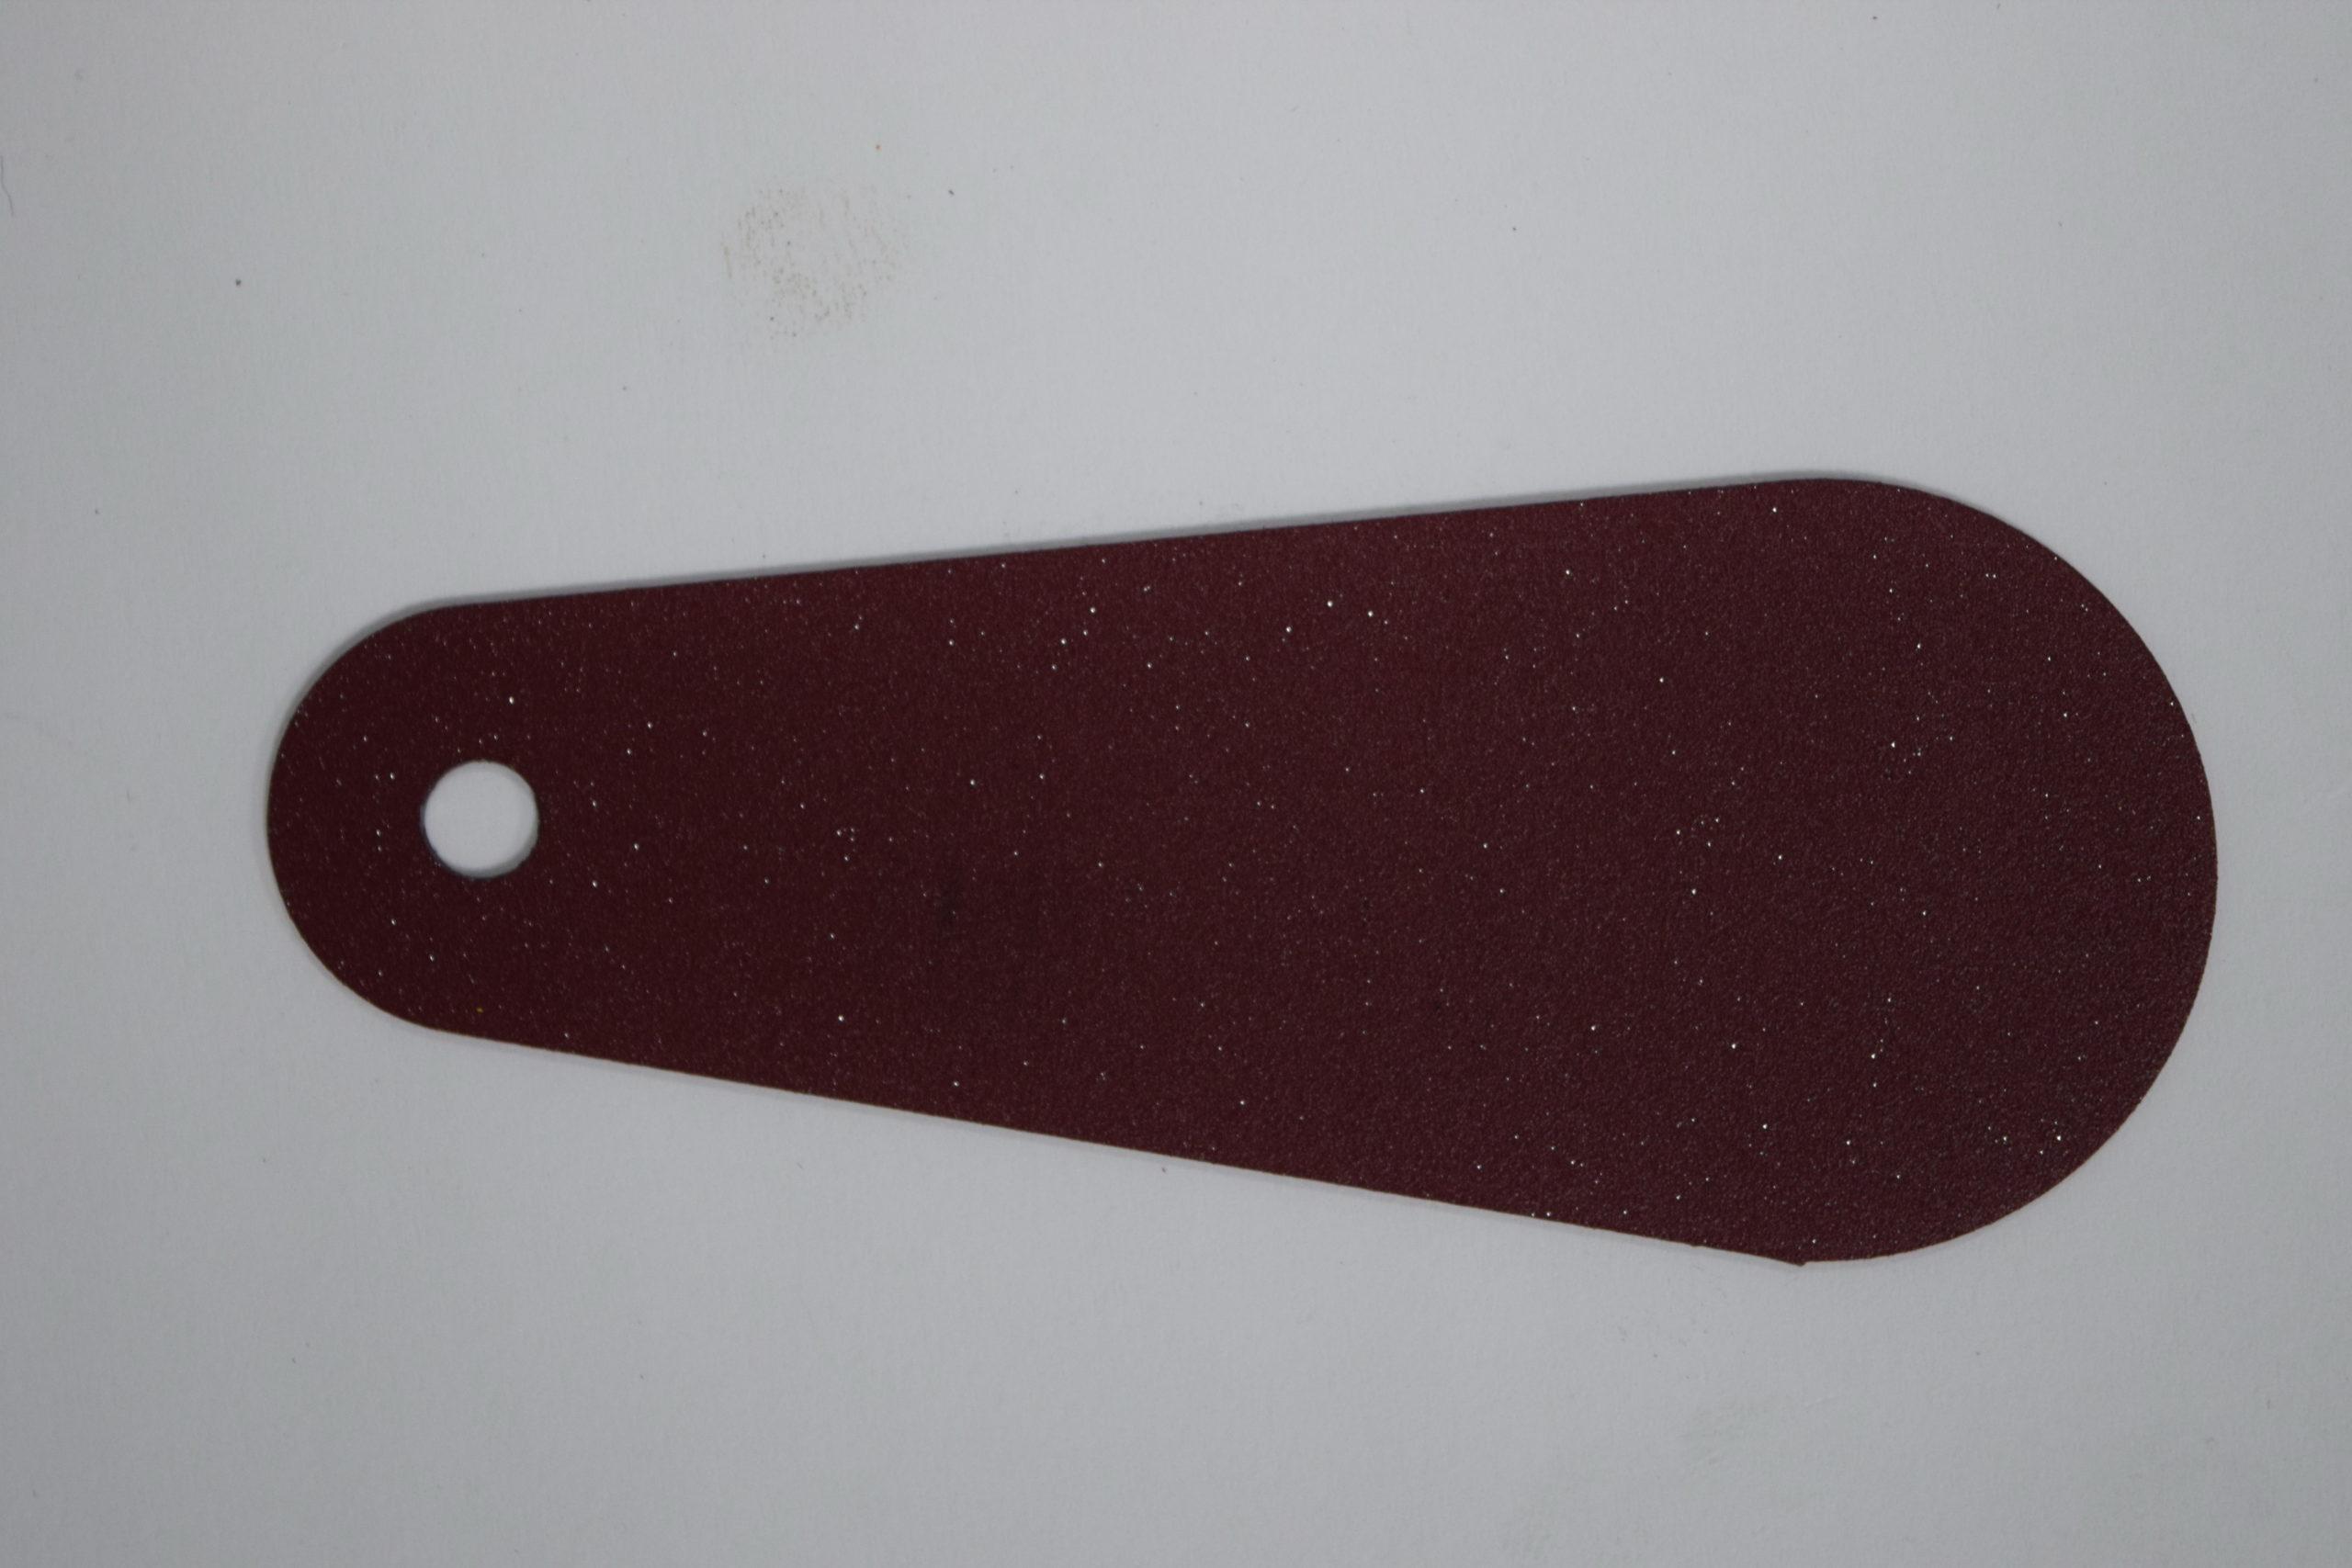 3004 Порошковая краска П-ПЛ-1015-4 ИПВ RAL 3004 (муар-металлик)/20кг